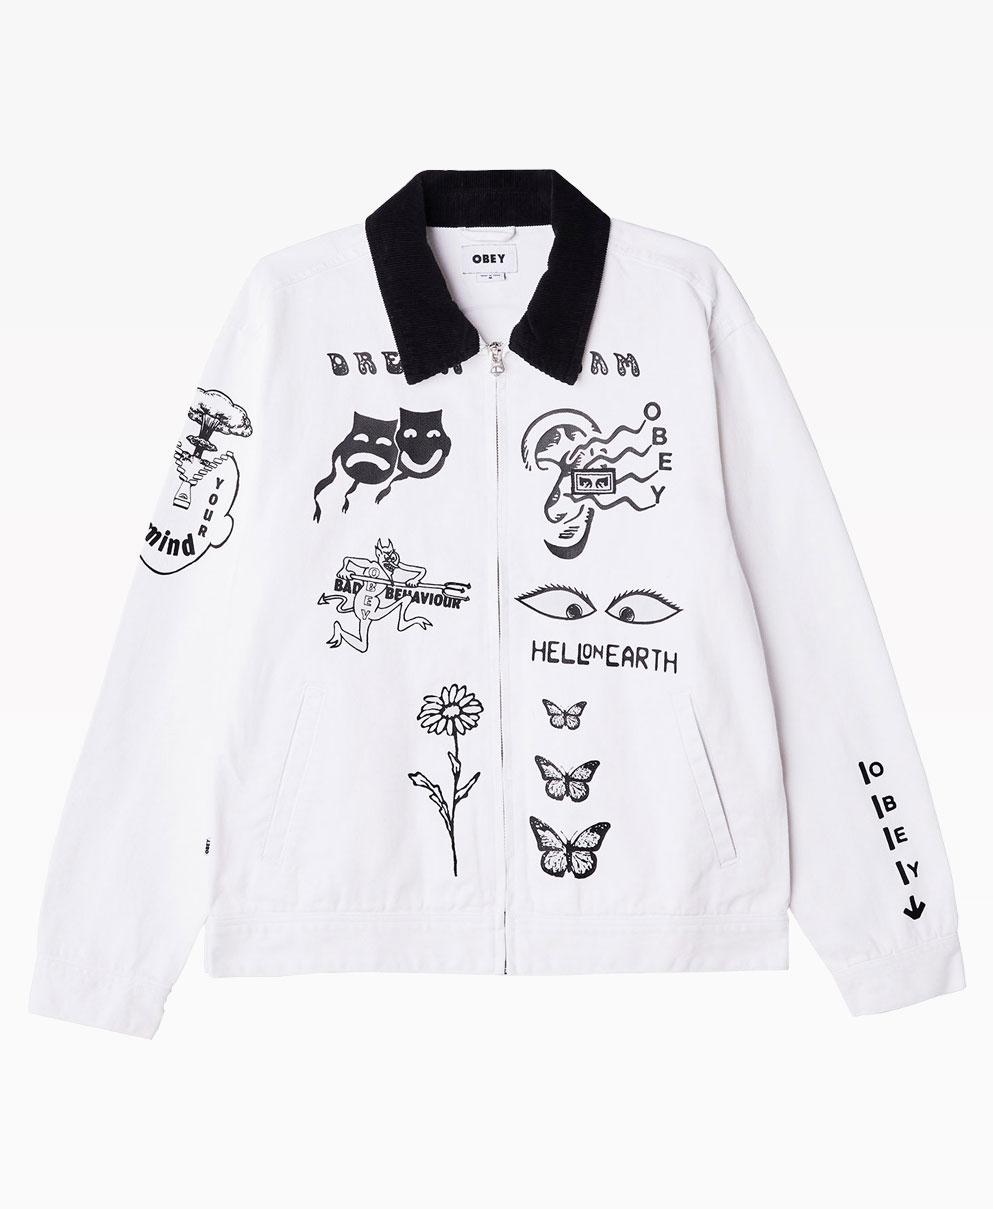 Obey Clothing Dream Twam Denim Jacket White Front